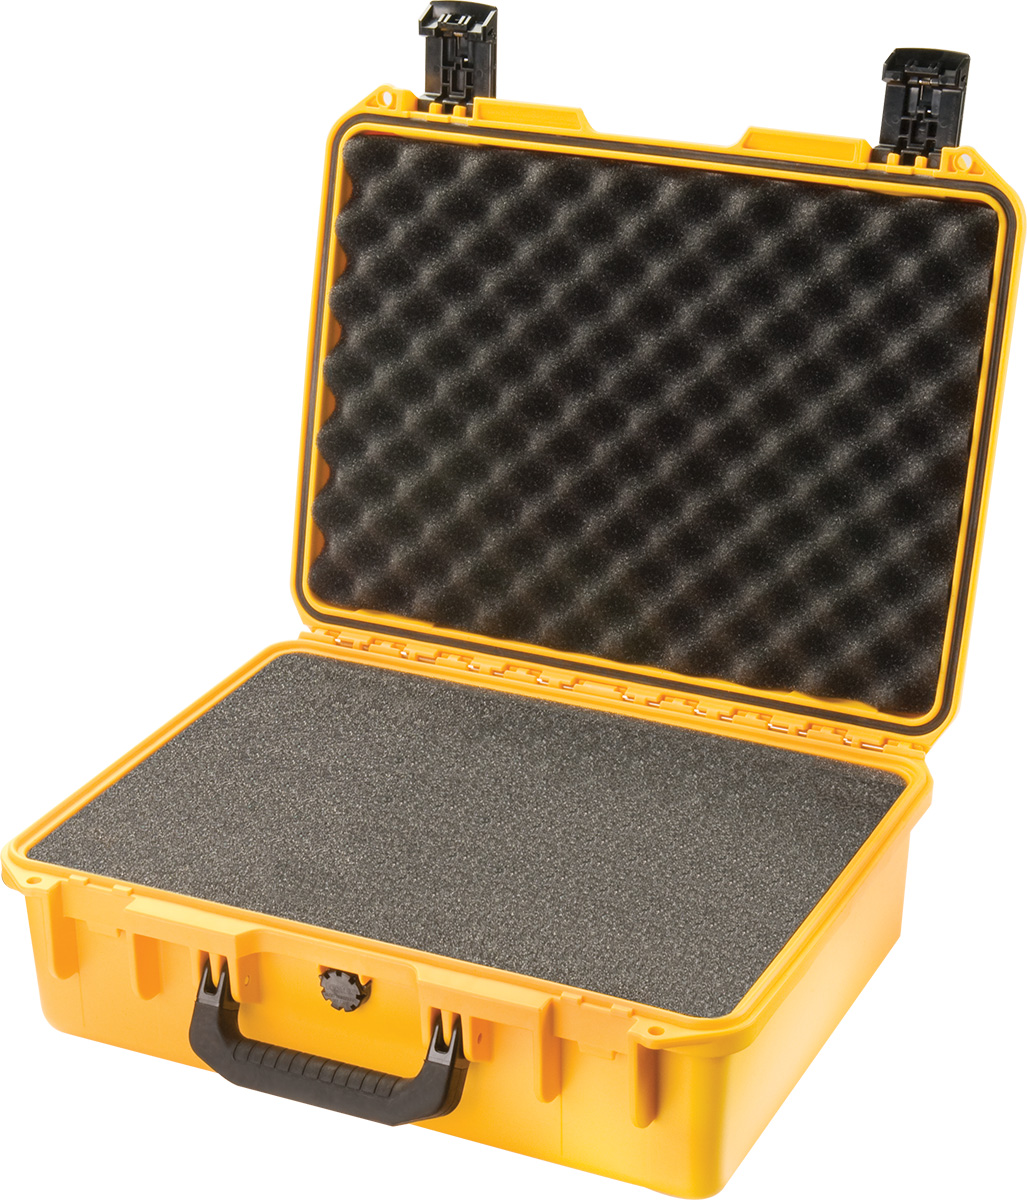 pelican im2400 storm yellow photography case